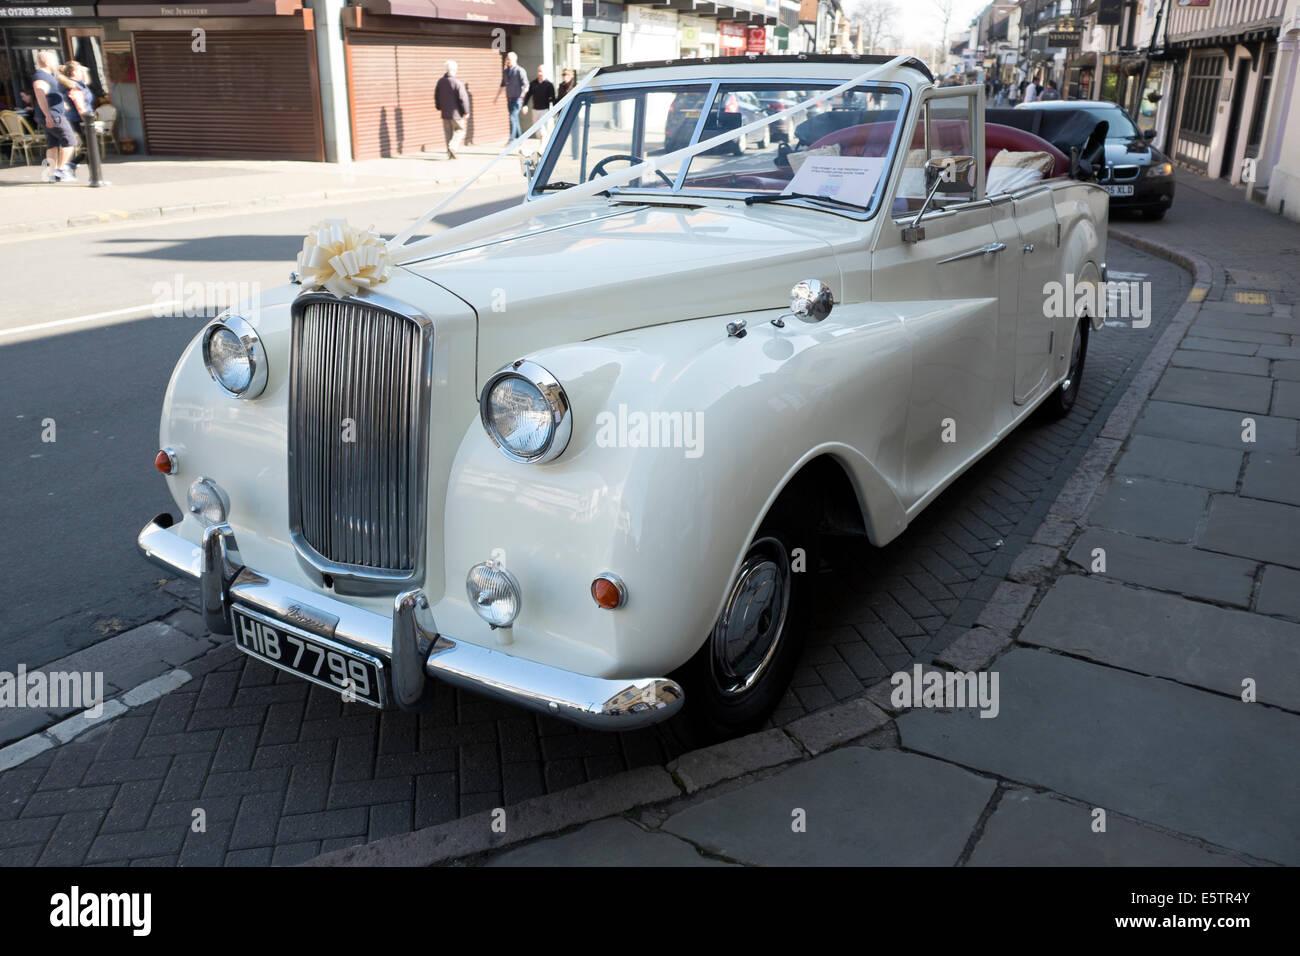 Rolls Royce Wedding Car Stock Photos & Rolls Royce Wedding Car Stock ...